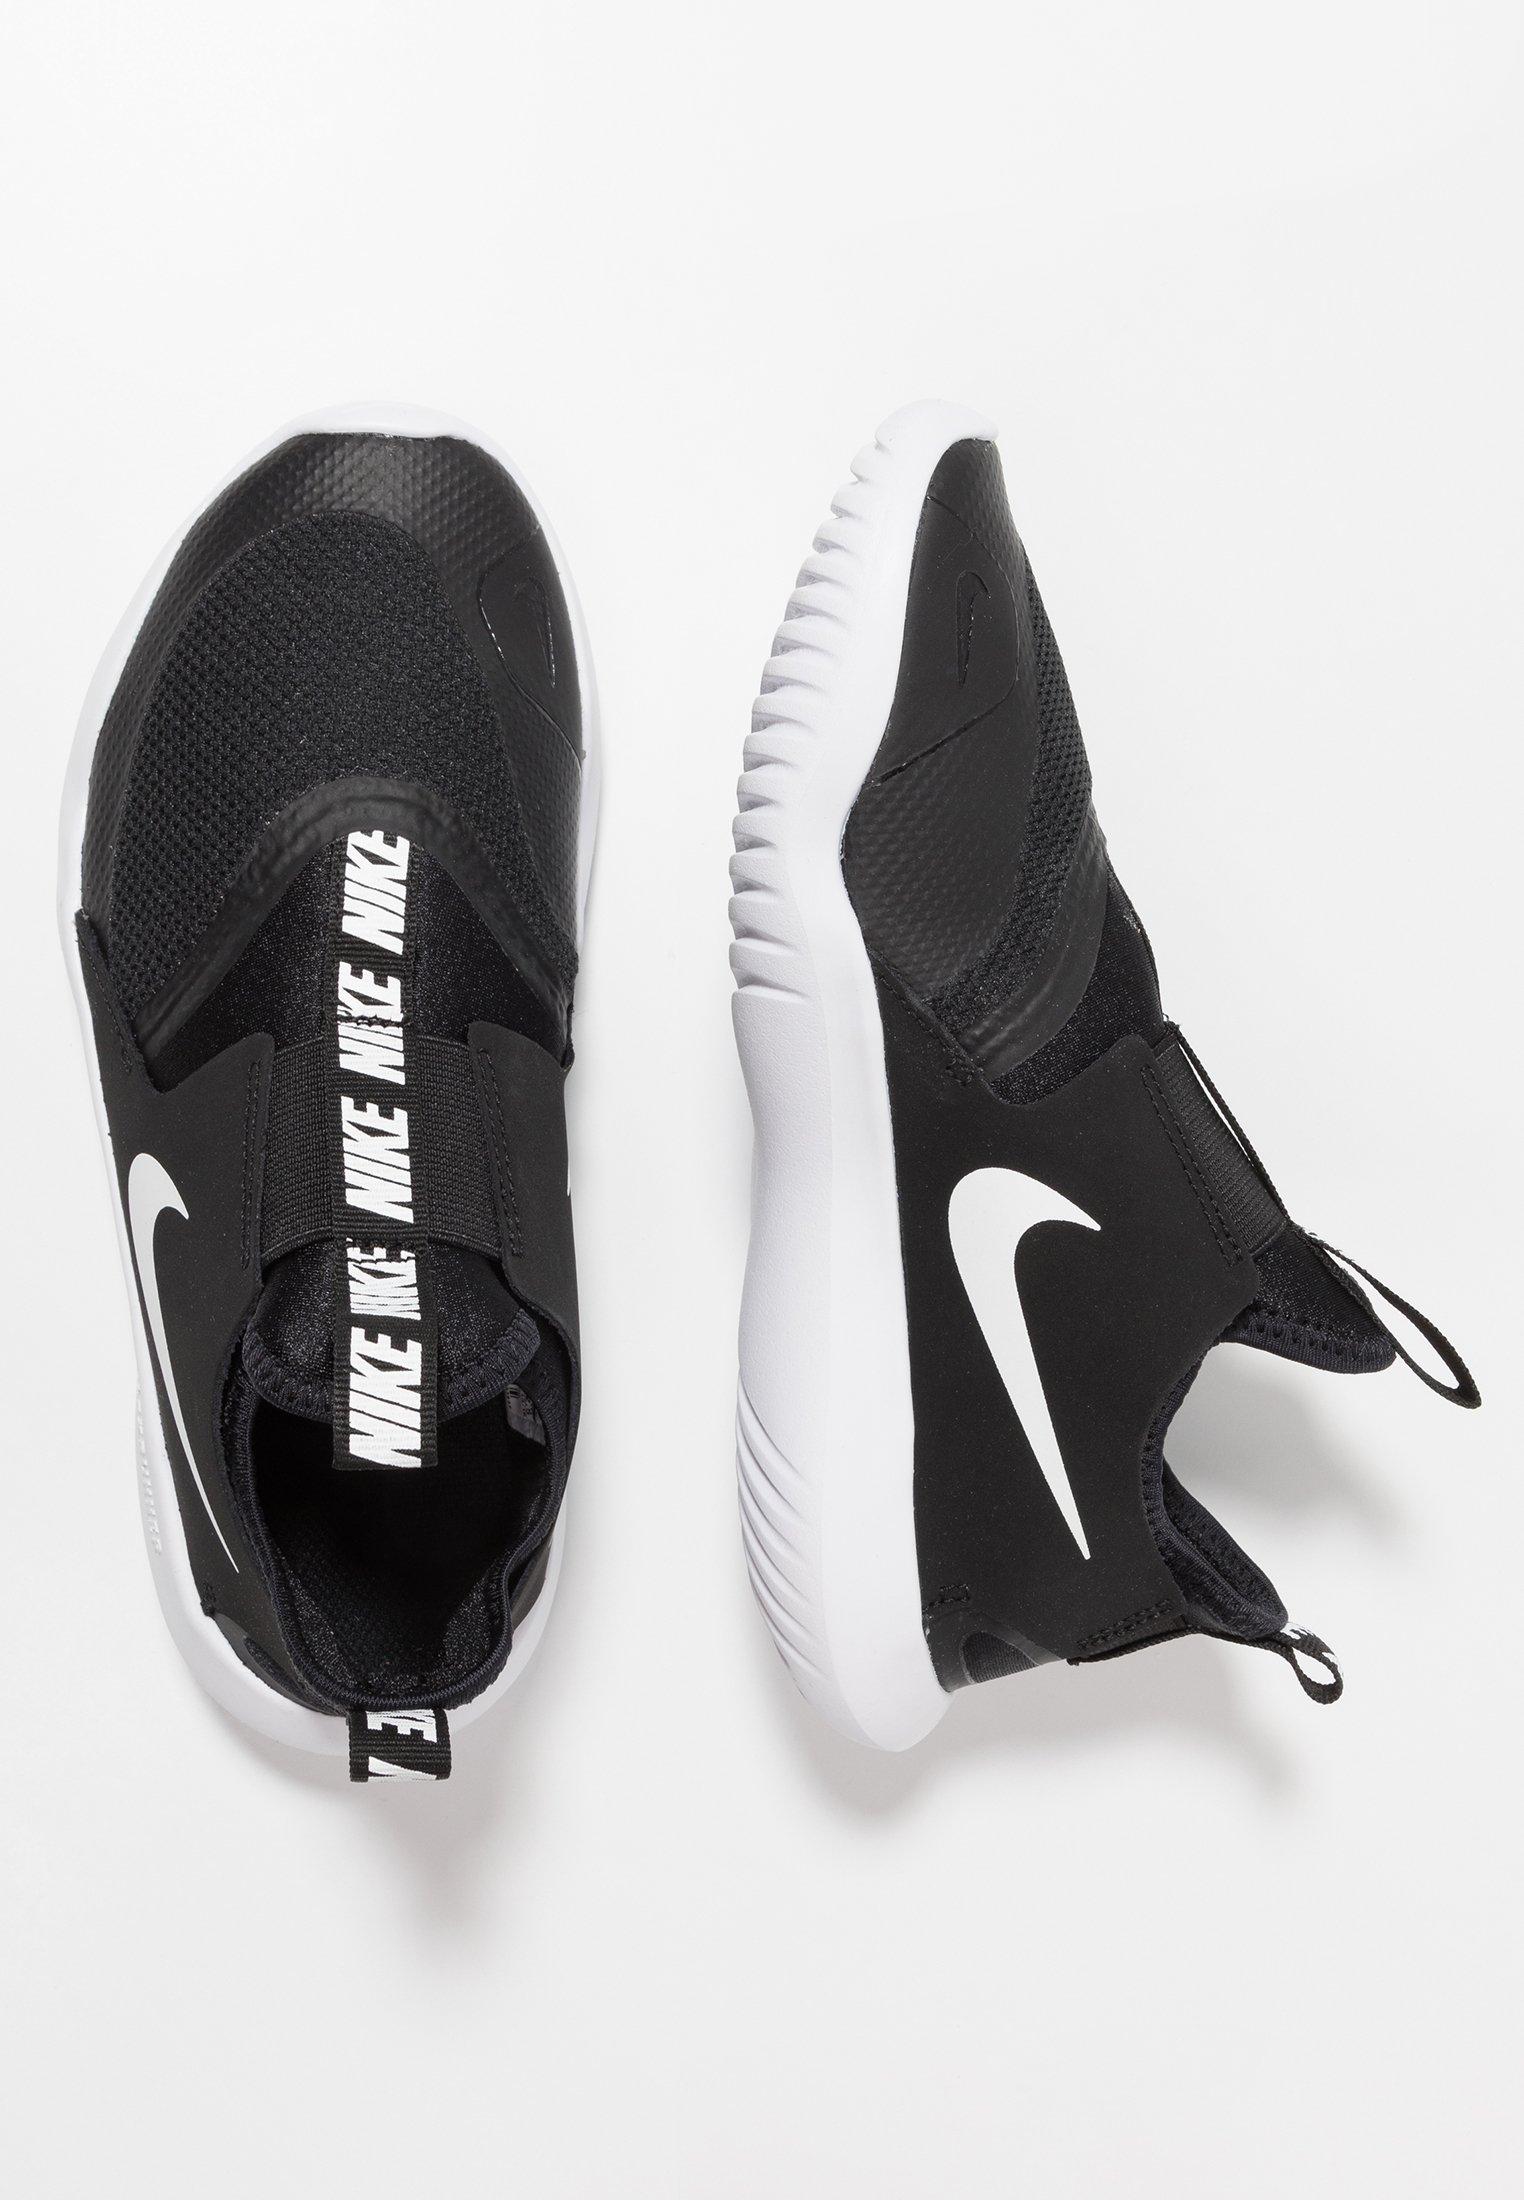 Enfant FLEX RUNNER UNISEX - Chaussures de running neutres